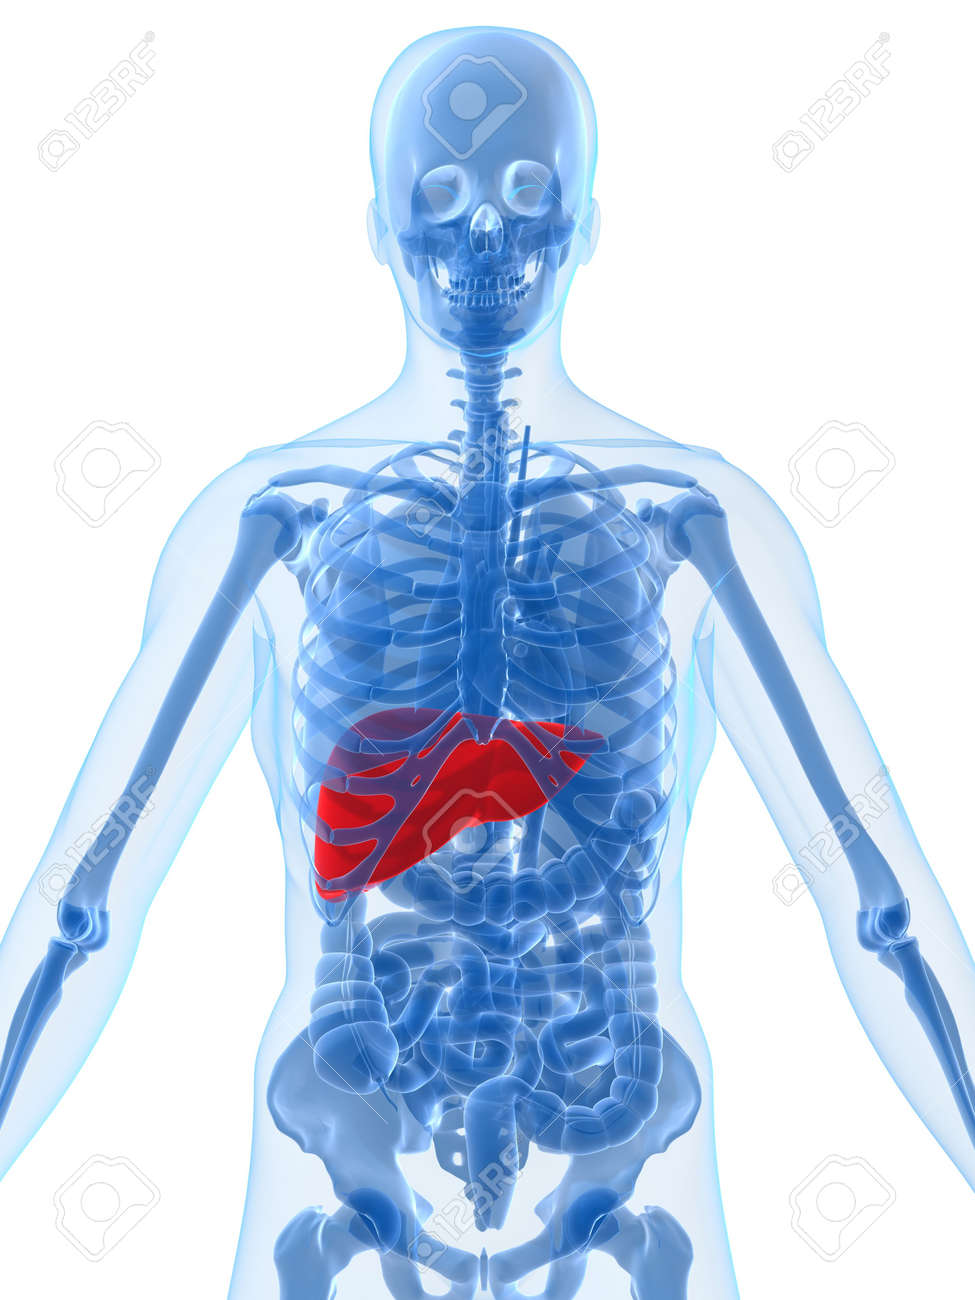 human anatomy with liver Stock Photo - 2021132